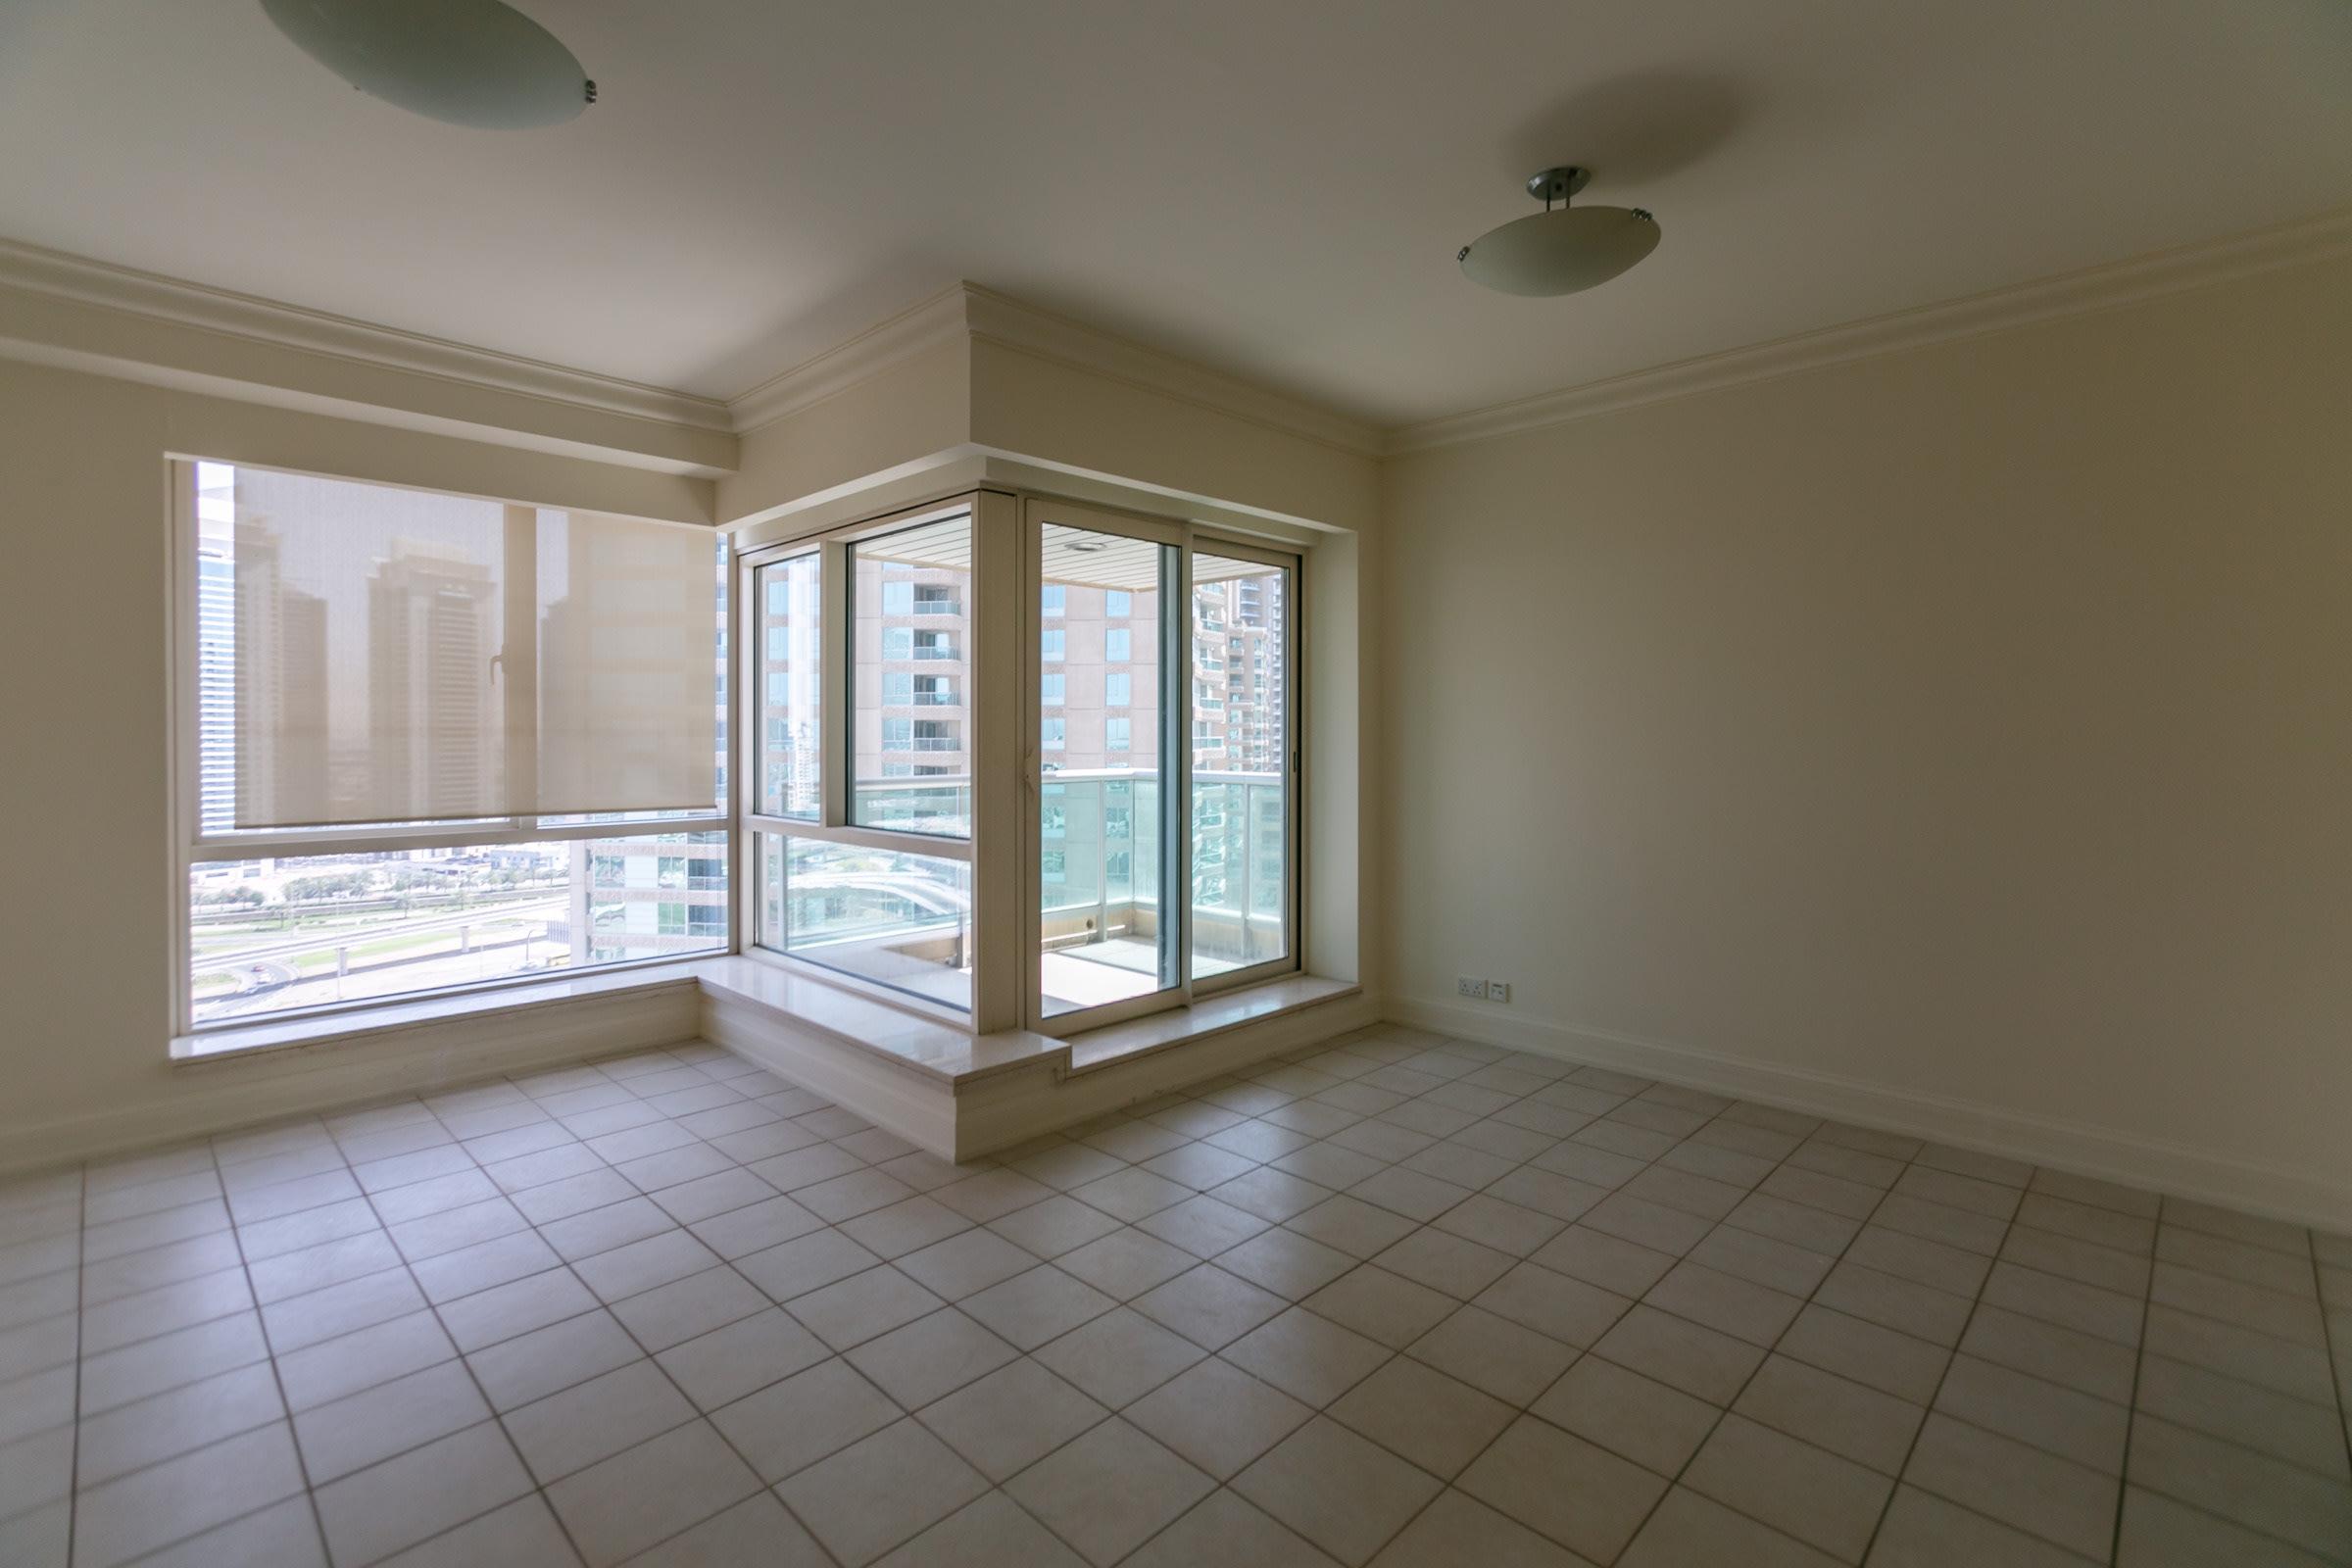 1 Bedroom + Study   Family Community   Great Price